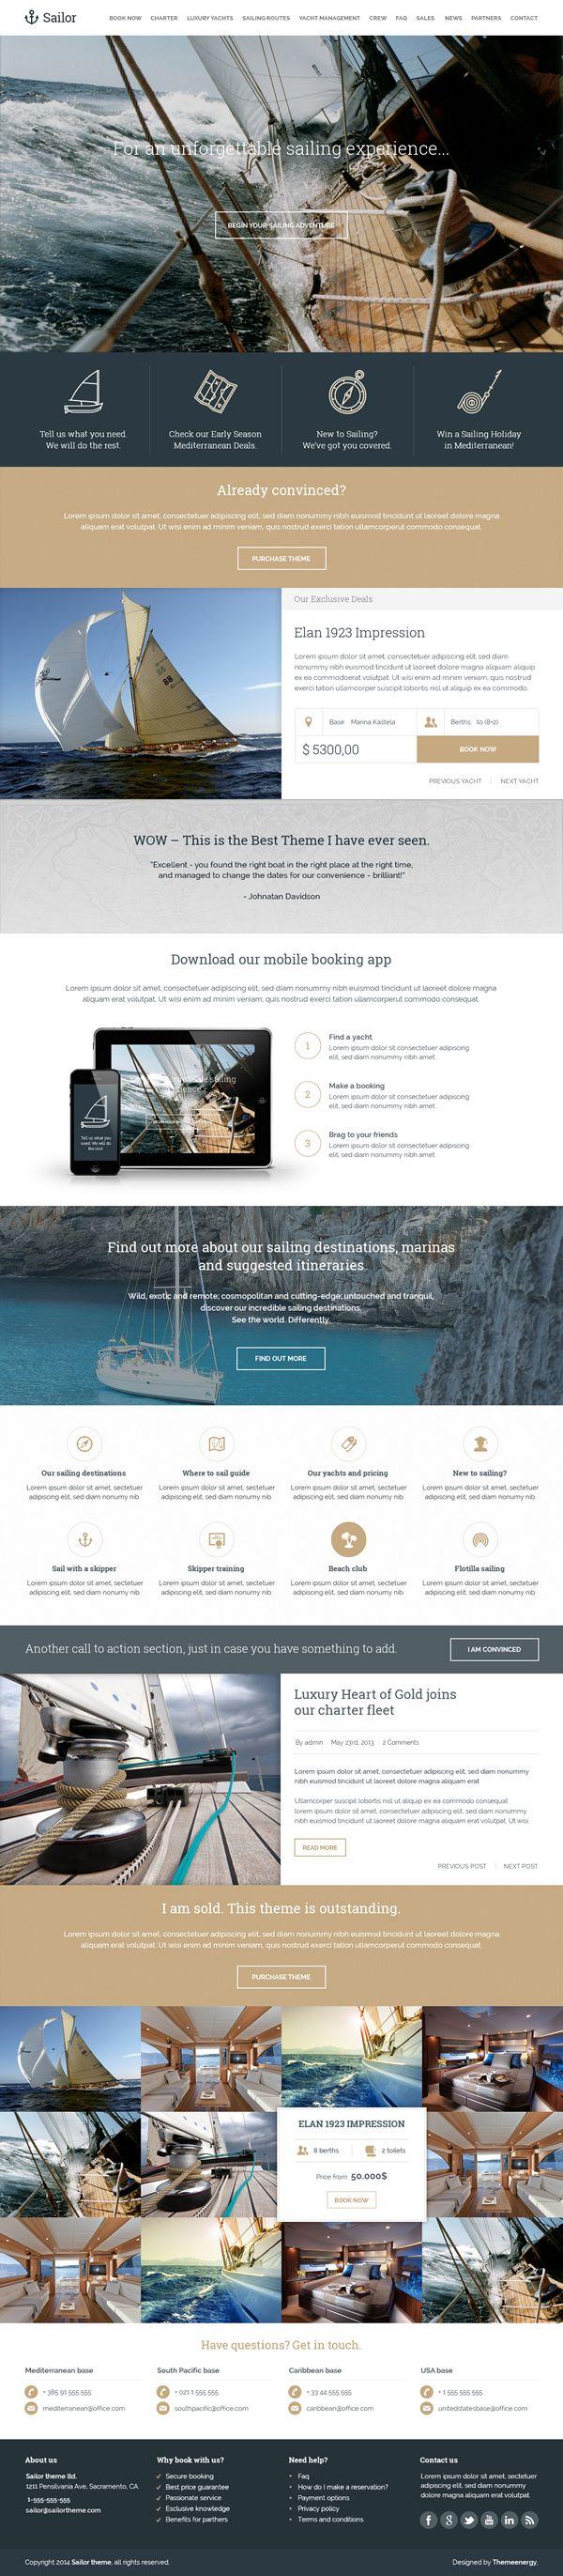 Sailor Yacht Charter Booking PSD Template